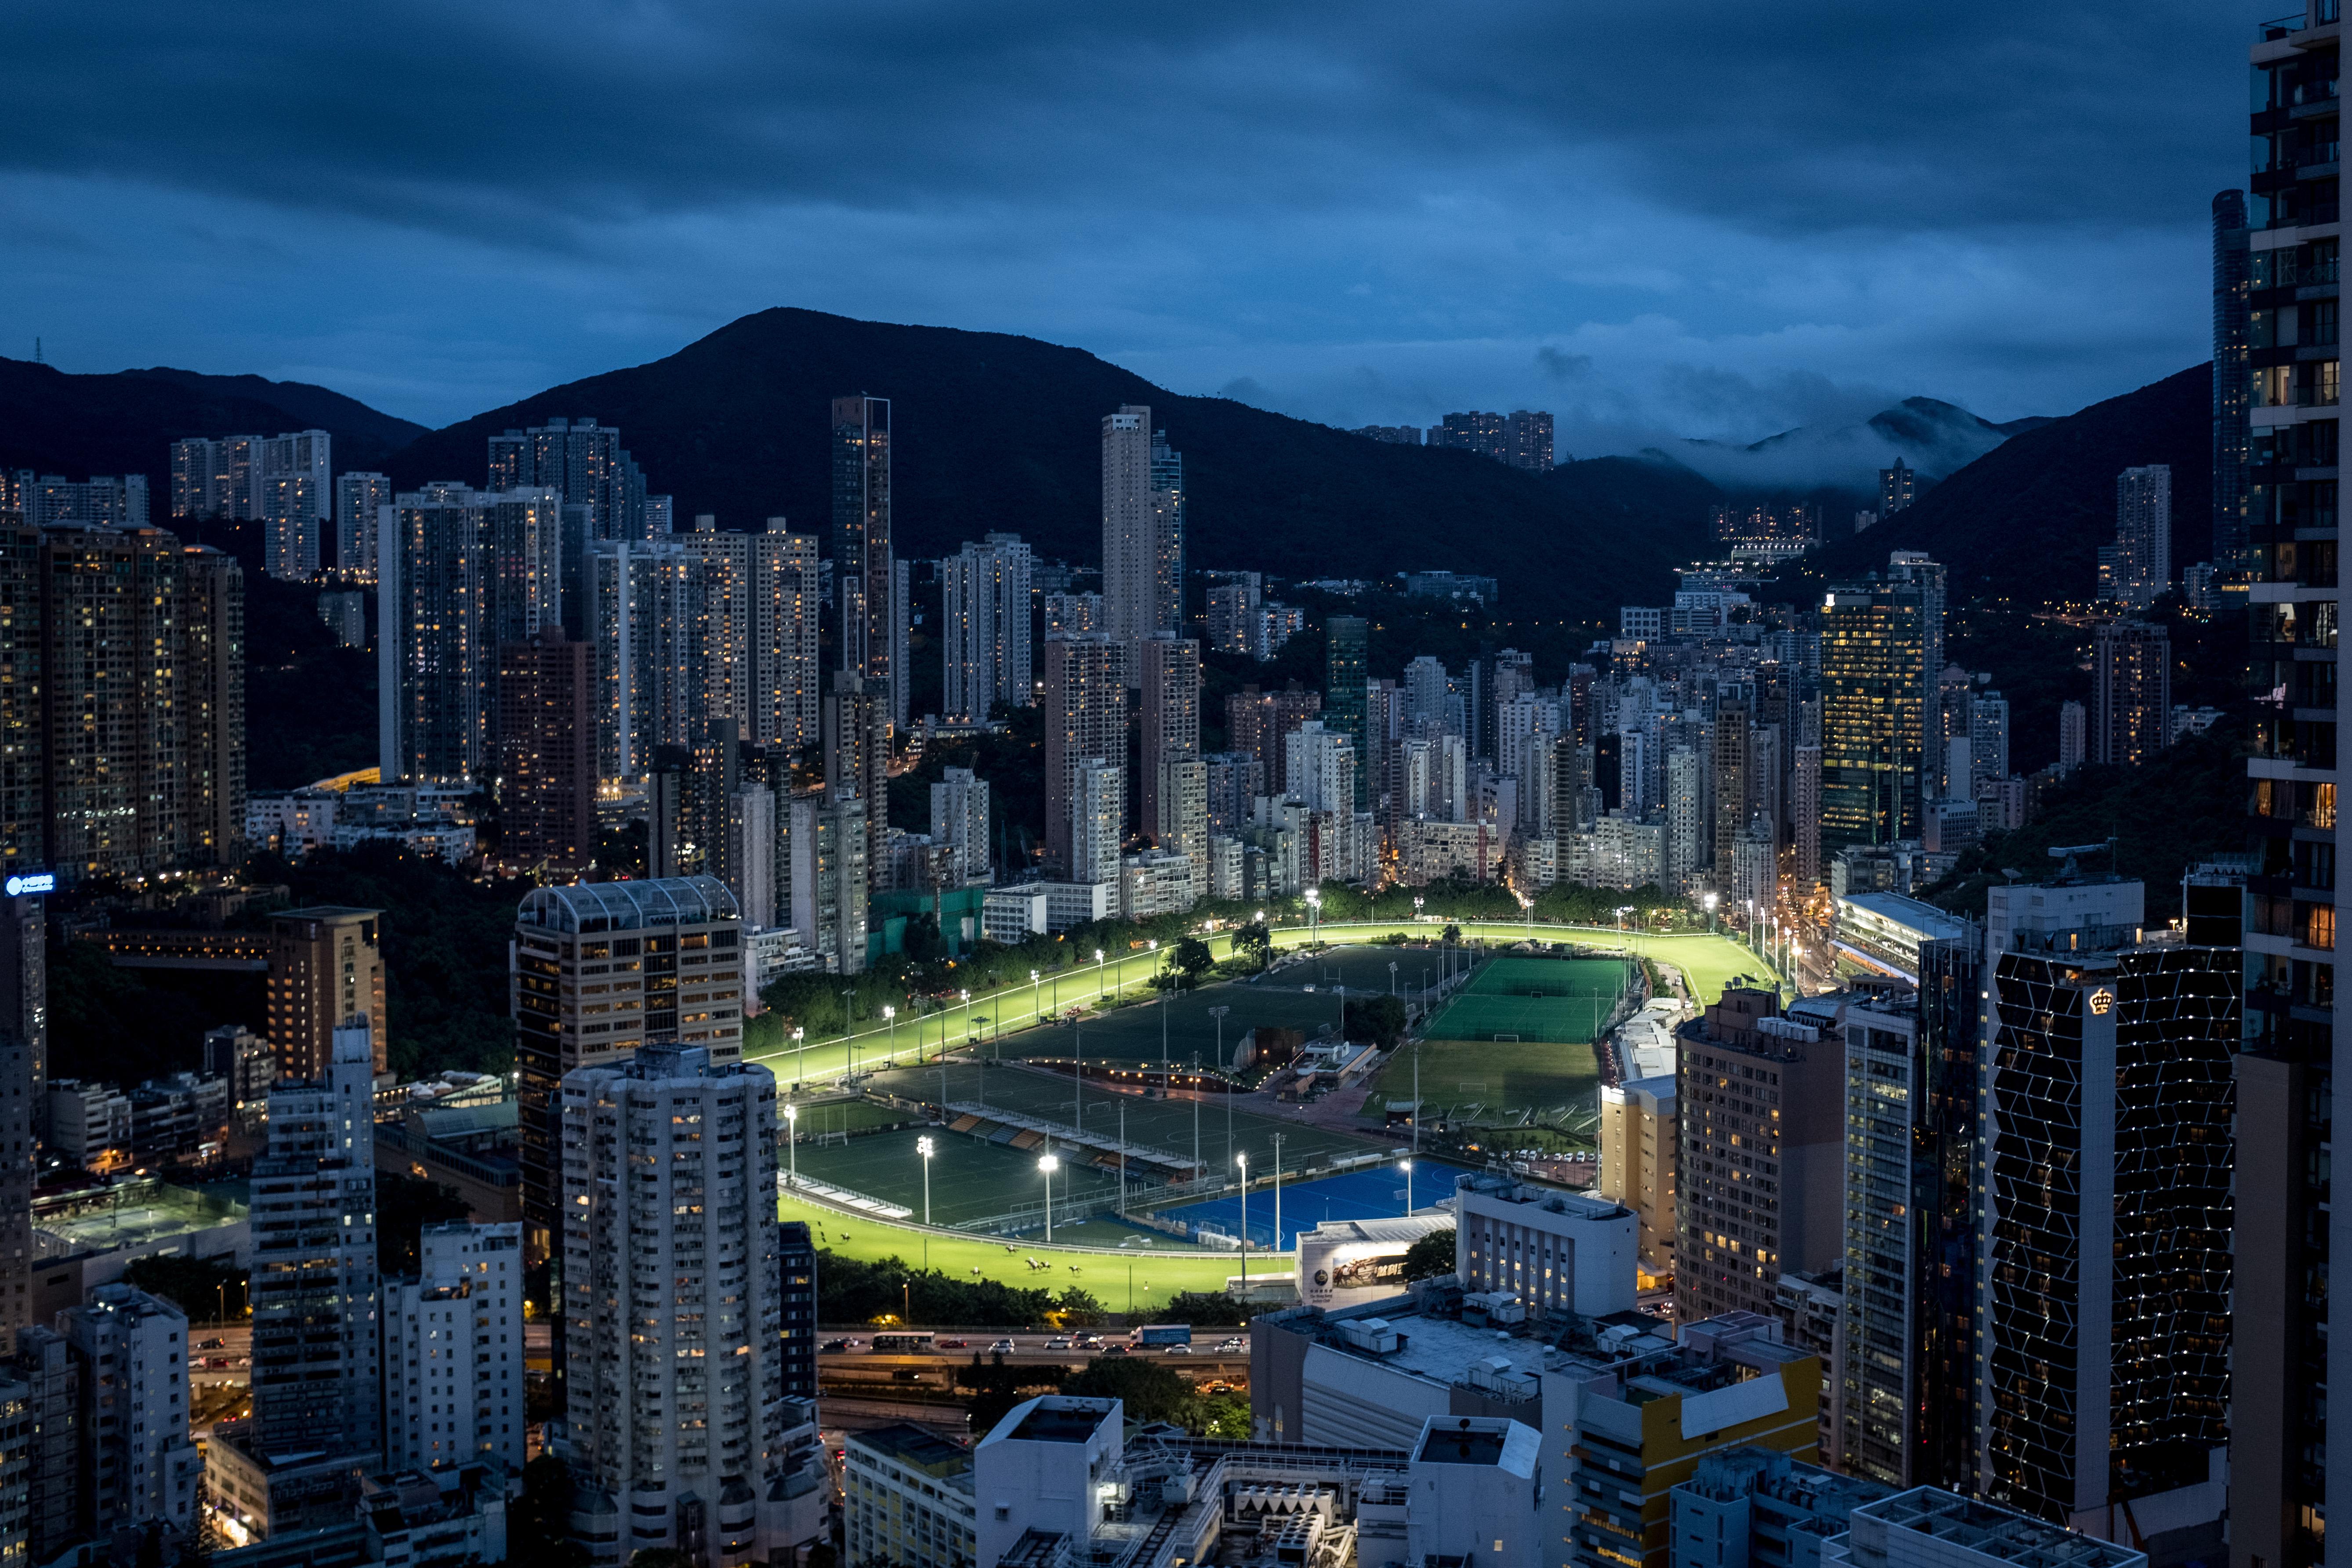 Hong Kong Betting Tips: No Racing Luck needed with Ho's mount in Valley handicap - CityAM